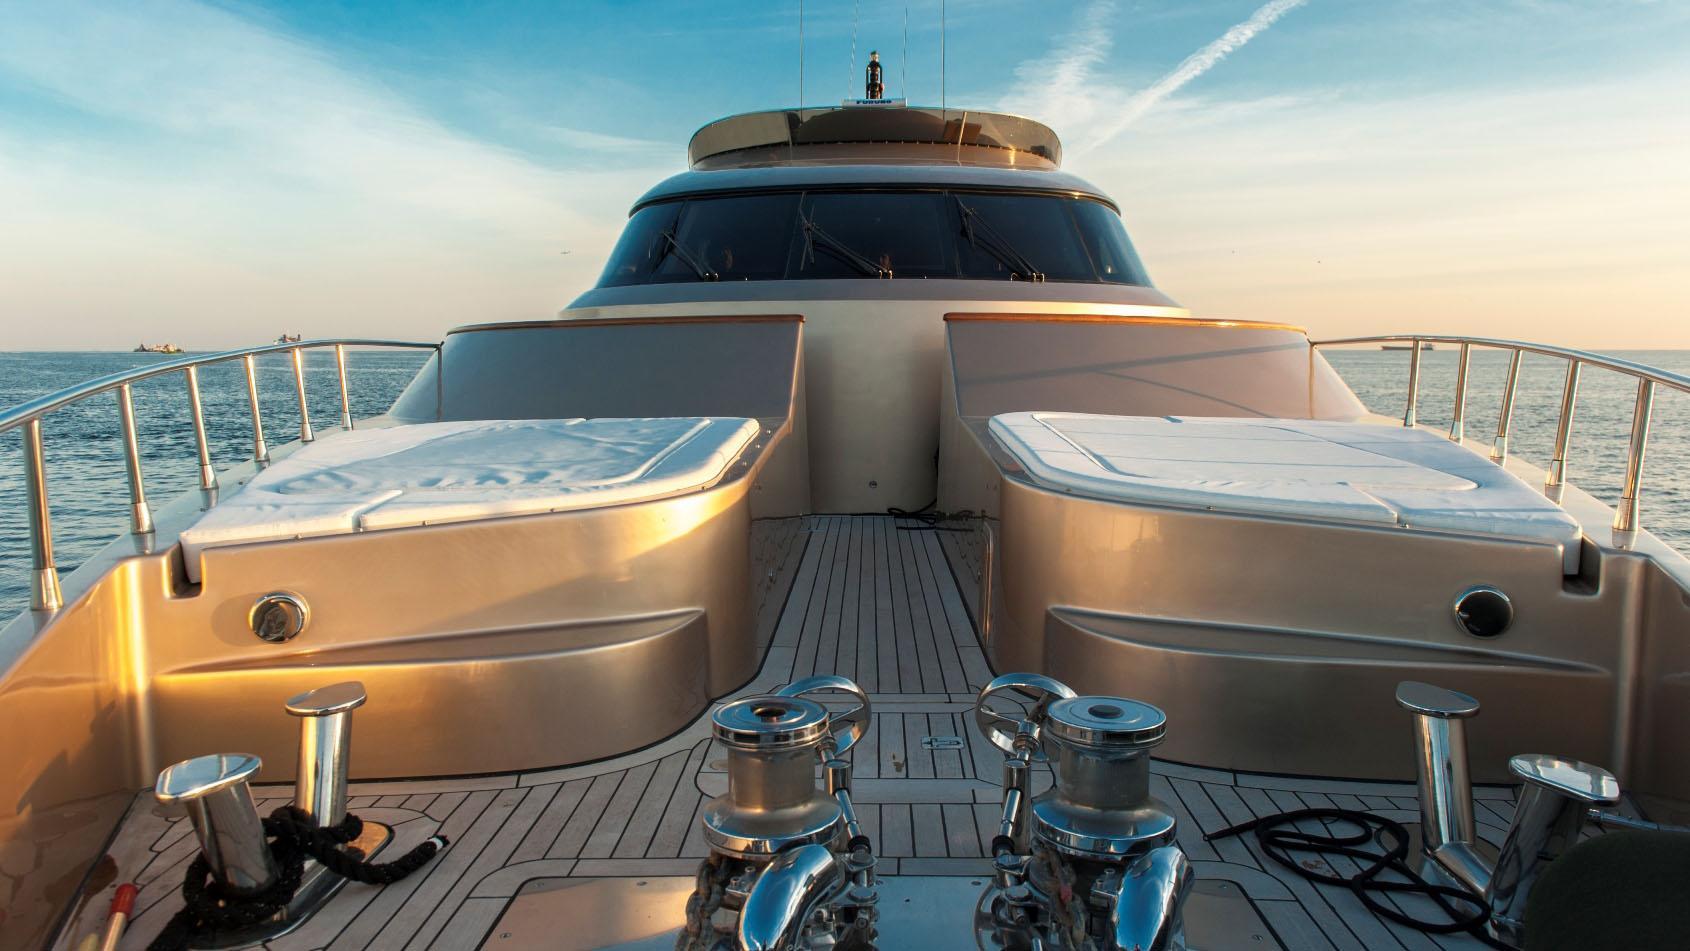 interceptor-xii-yacht-sun-loungers